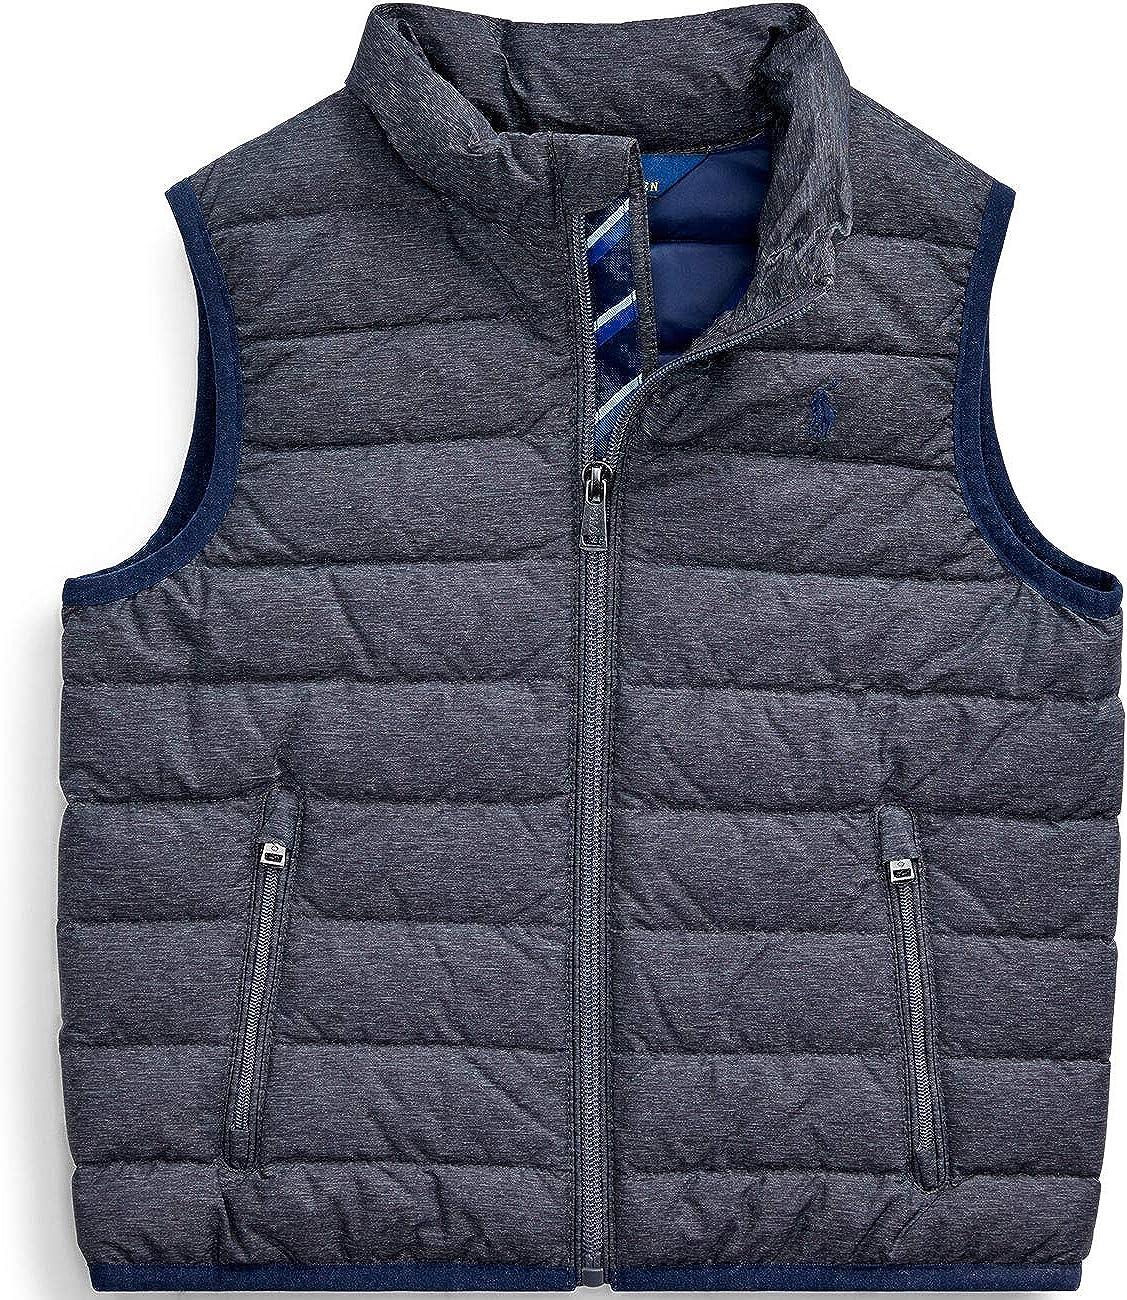 Ralph Lauren Polo Boys Performance Jacket Vest Small 8